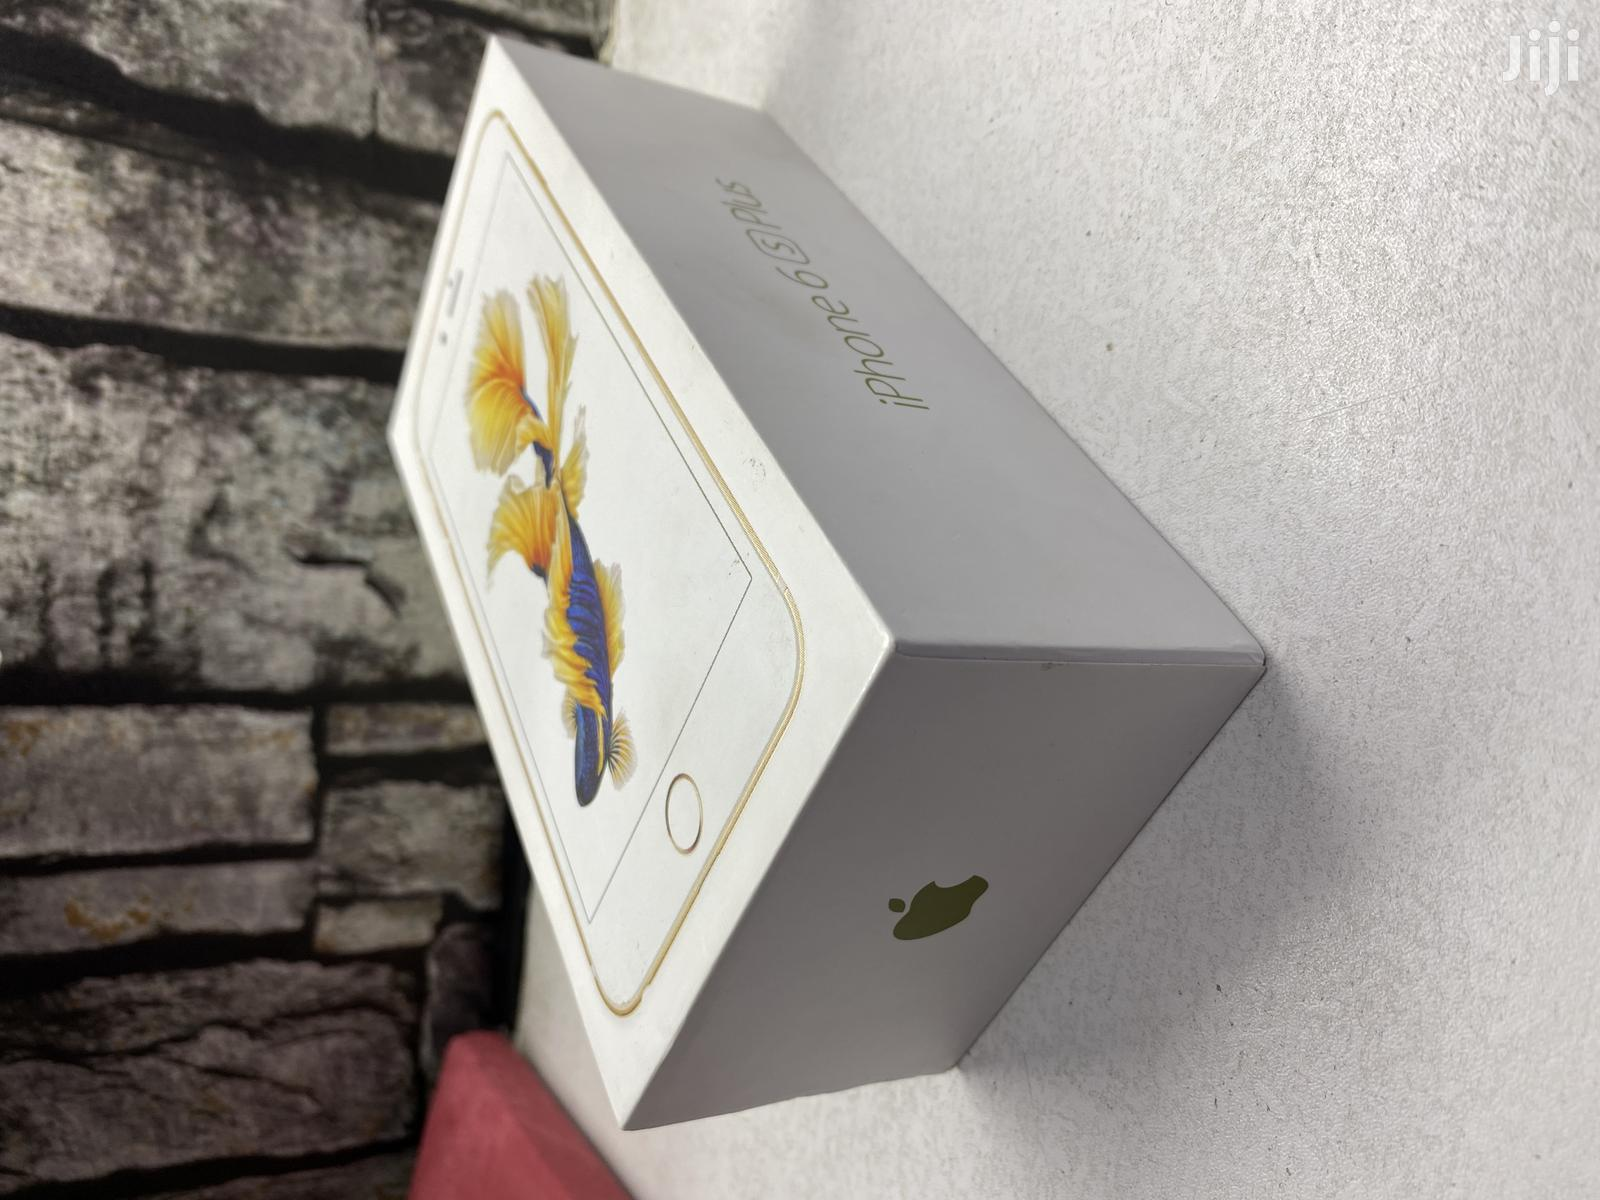 Apple iPhone 6s Plus 16 GB Gold | Mobile Phones for sale in Nairobi Central, Nairobi, Kenya